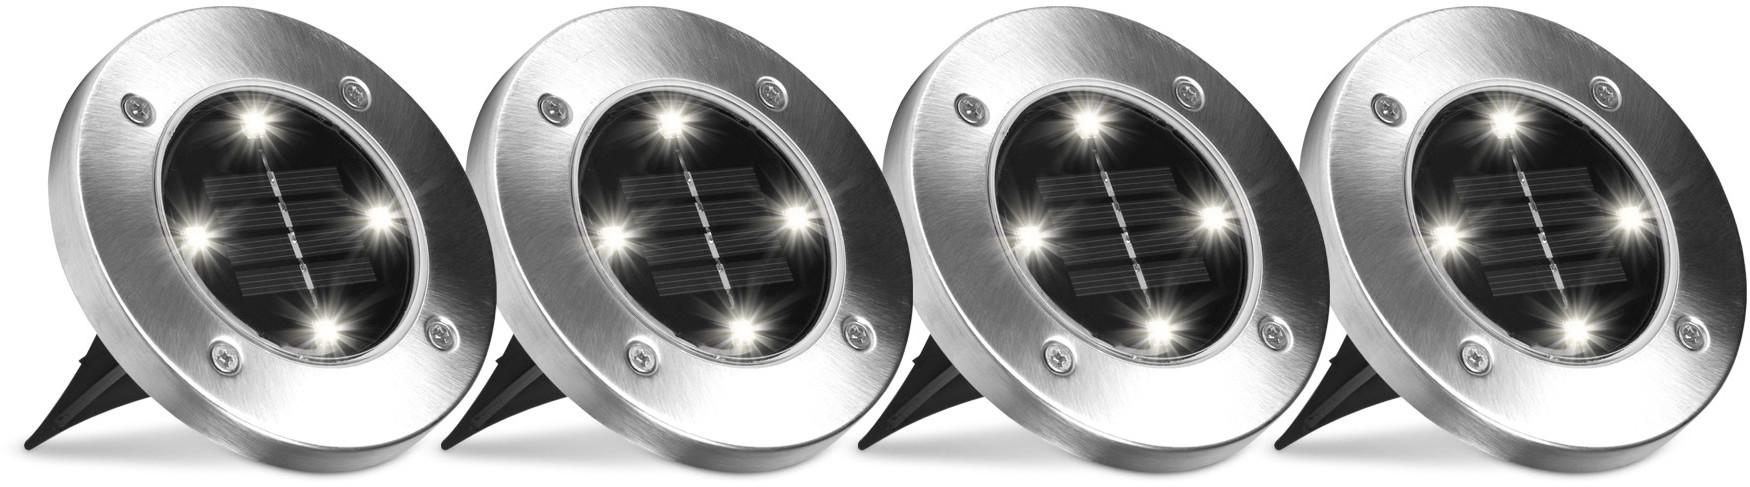 Top Shop Lampa solarna Disk Lights zestaw 4 sztuk Top Shop